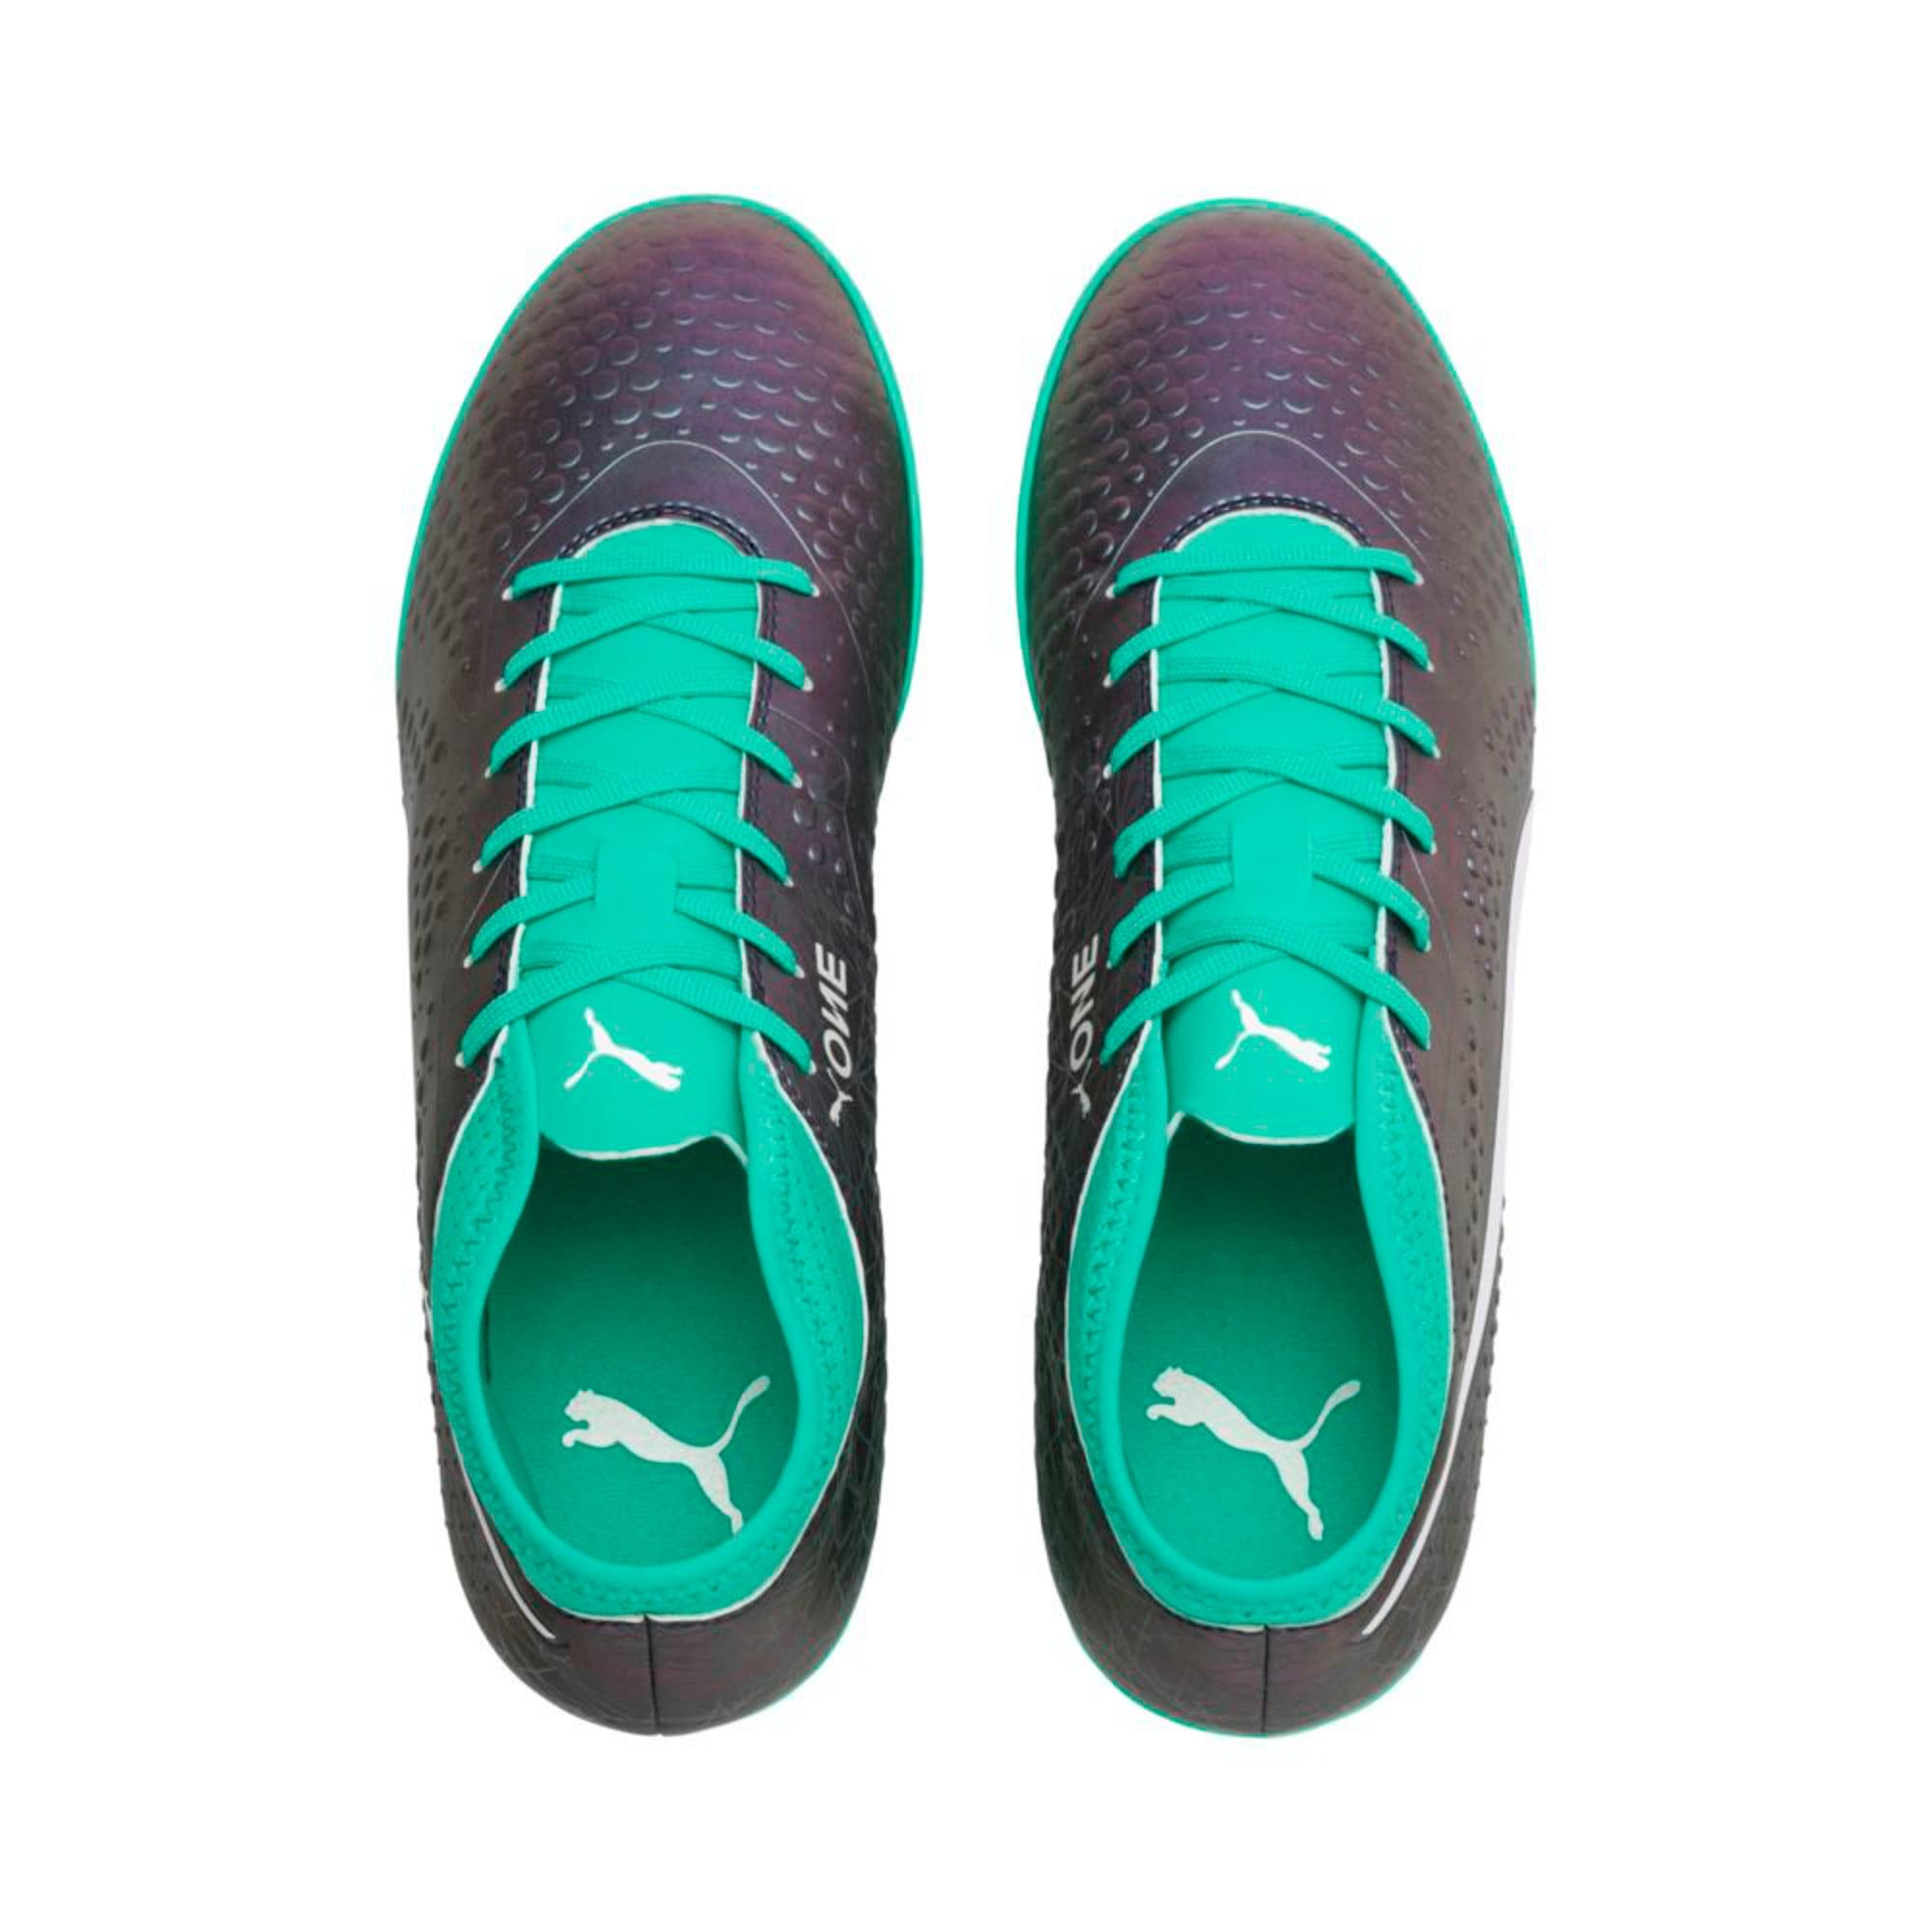 Thumbnail 3 of ONE 4 ILLUMINATE Synthetic TT  Football Boots, Col Shift-Green-White-Black, medium-IND